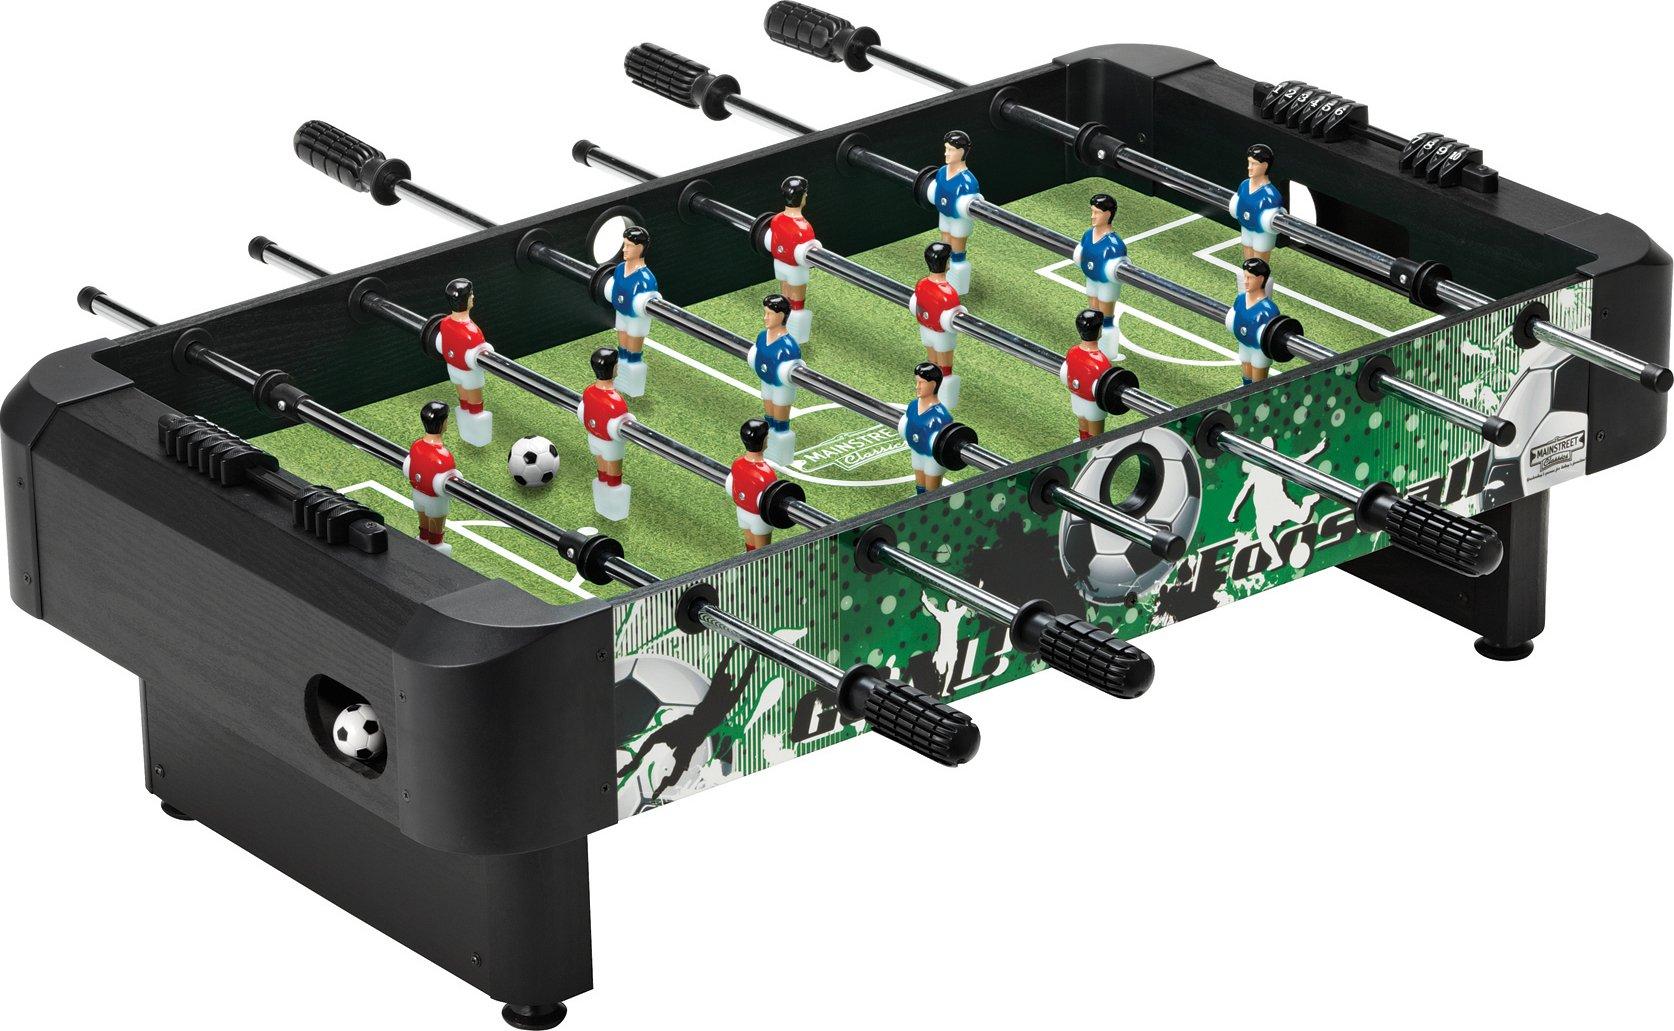 Mainstreet Classics 36-Inch Table Top Foosball/Soccer Game by Mainstreet Classics by GLD Products